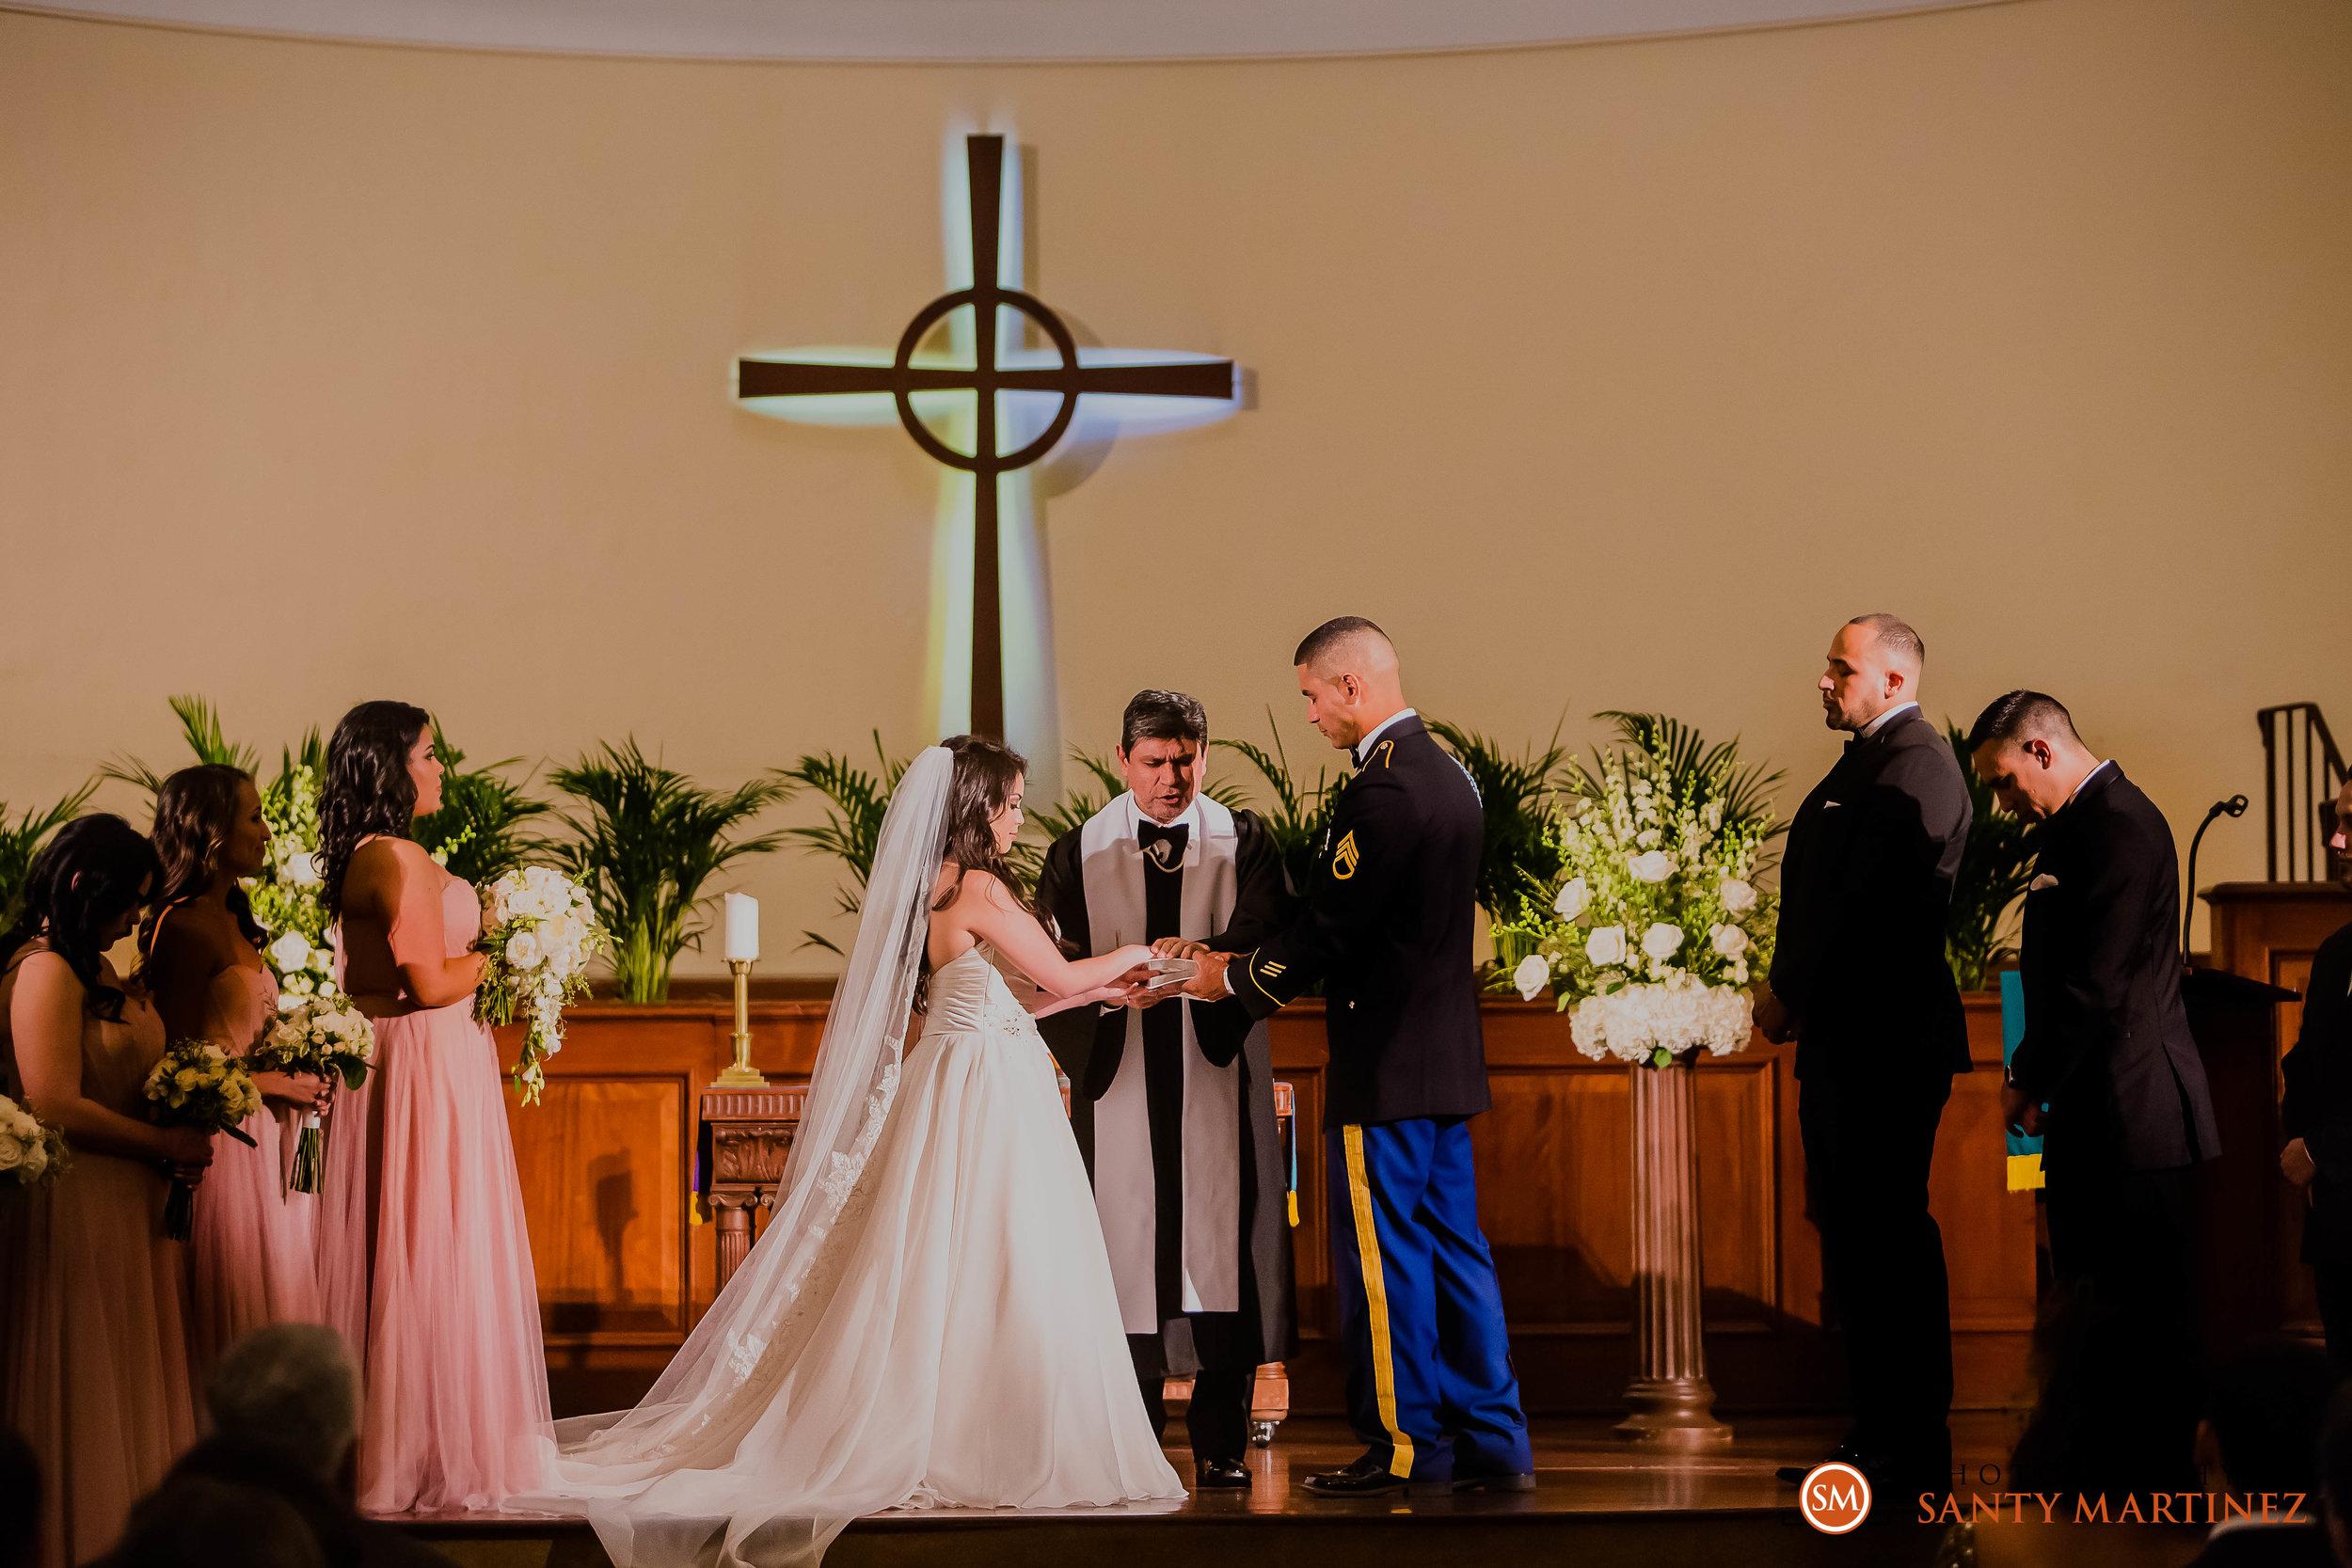 Wedding First Miami Presbyterian Church - Photography by Santy Martinez-20.jpg